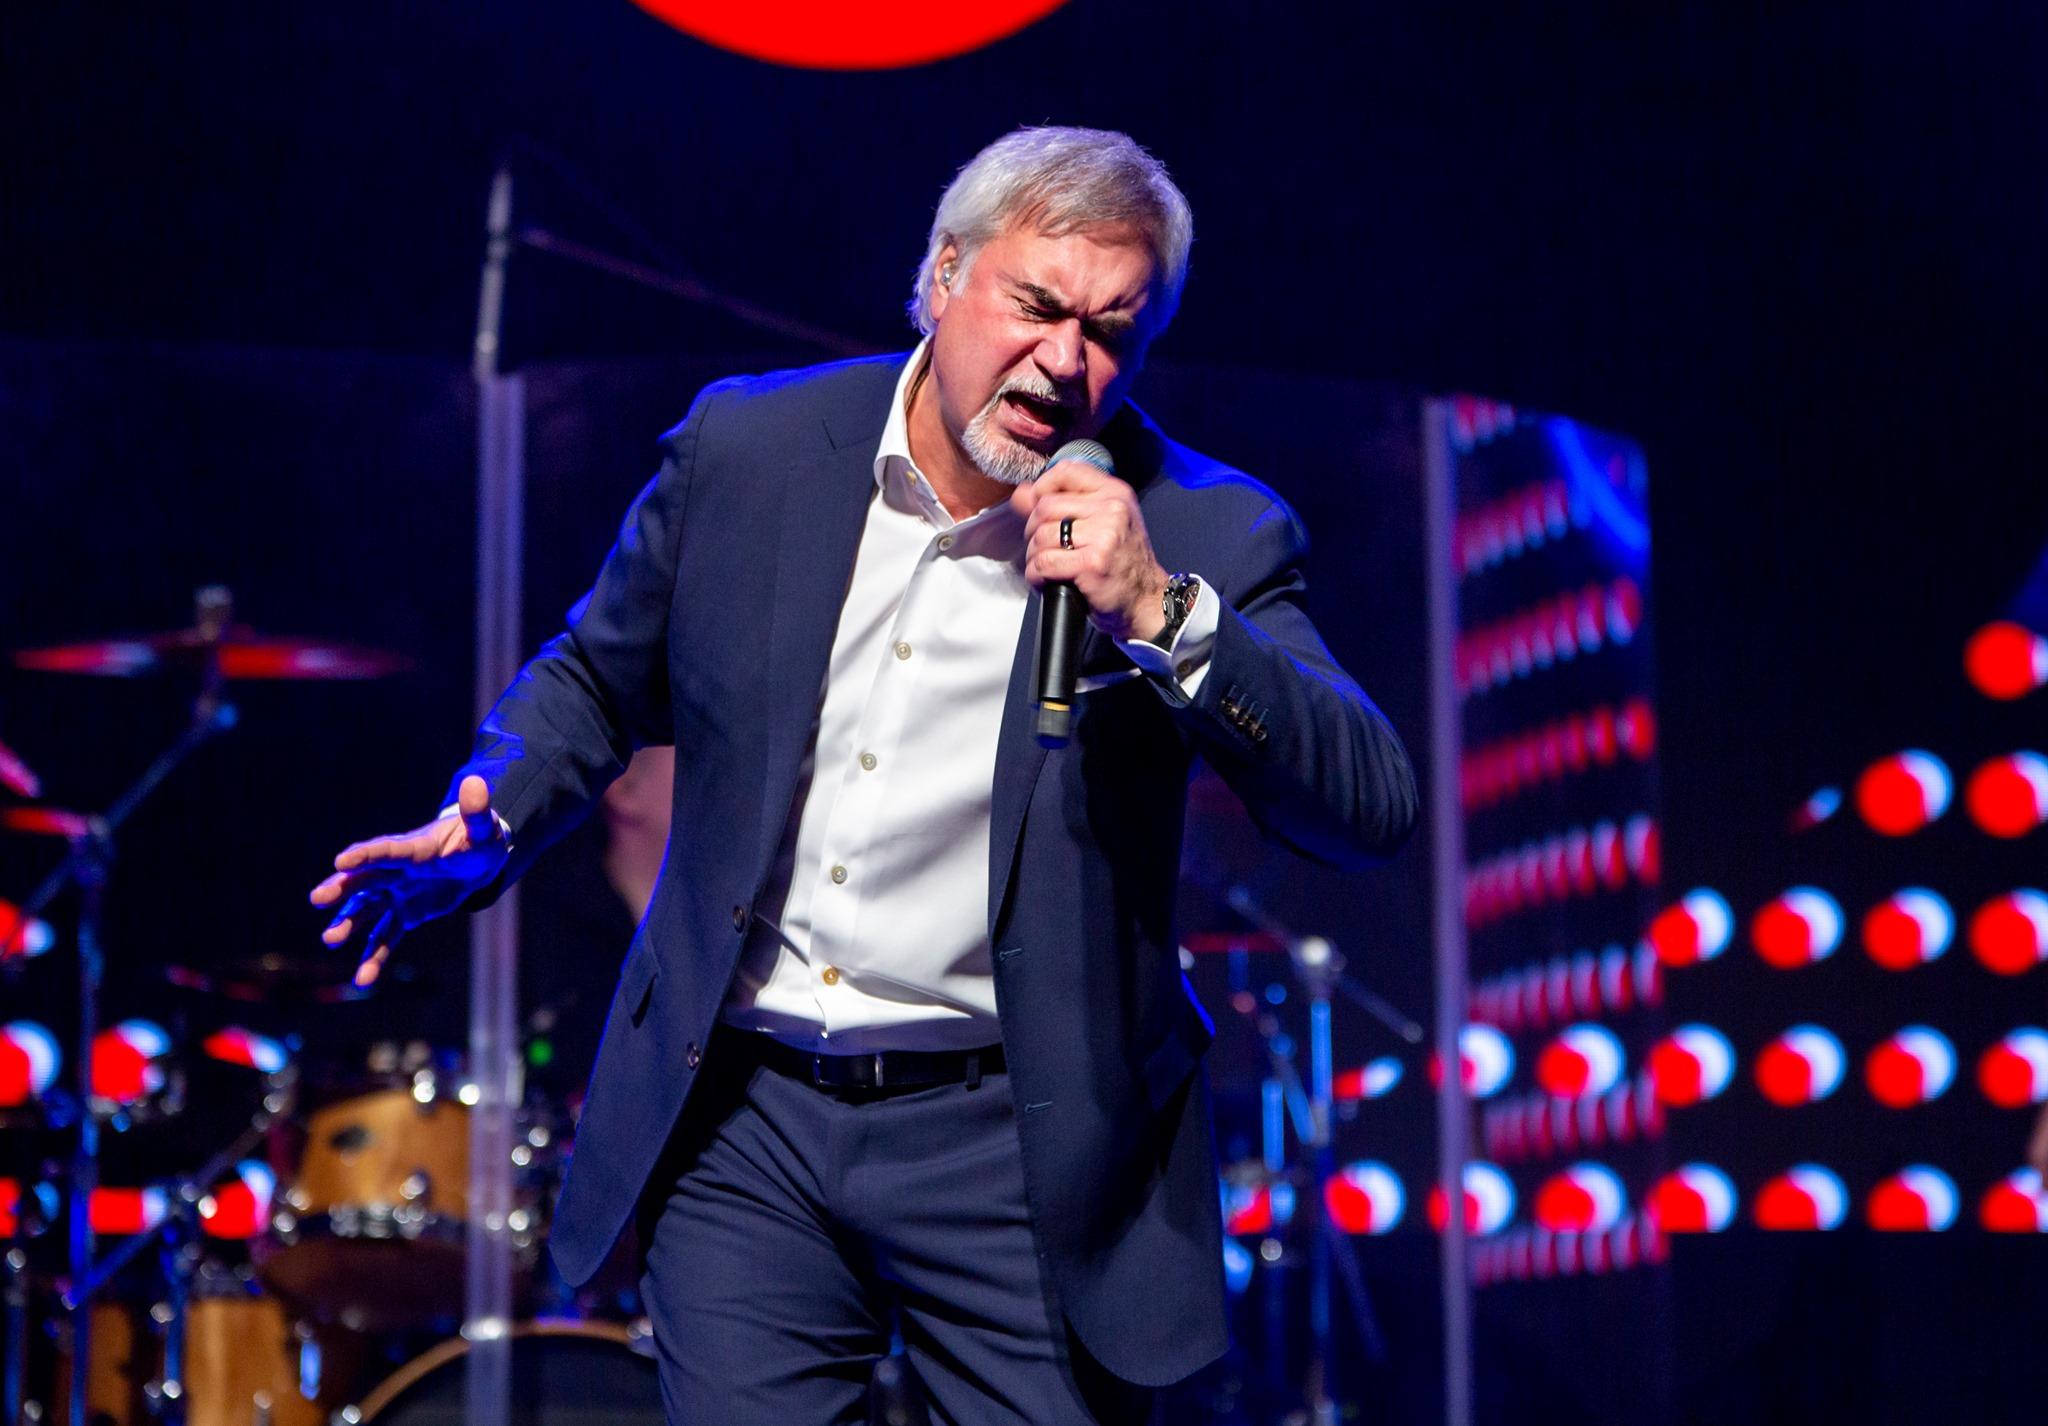 Любимый Валерий Меладзе: отчет о концерте